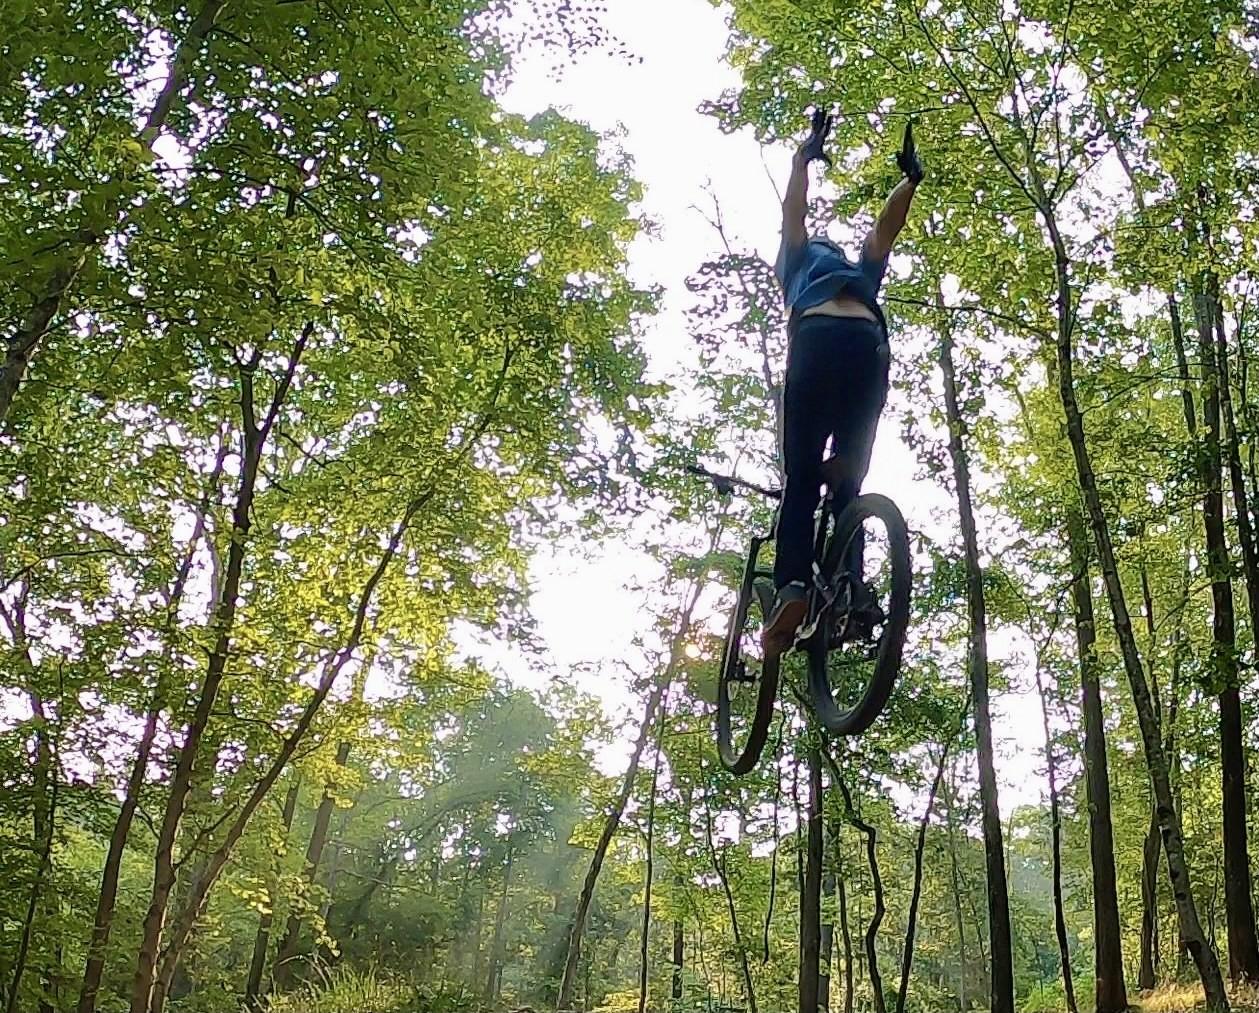 image0 (1) - craigwohl - Mountain Biking Pictures - Vital MTB